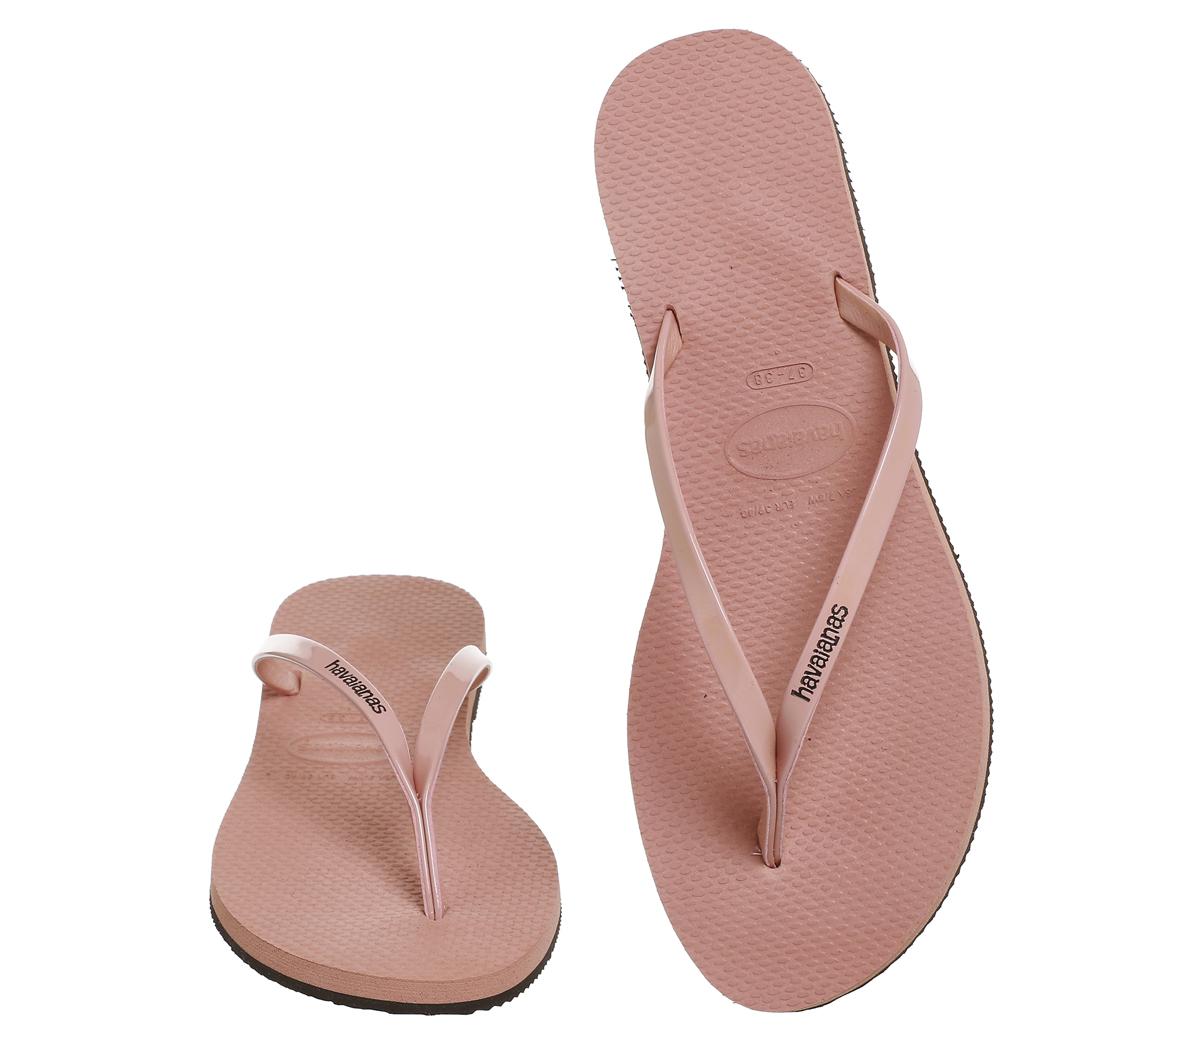 27743bb73 Sentinel Womens Havaianas Slim You Metallic Flip Flops LIGHT ROSE Sandals